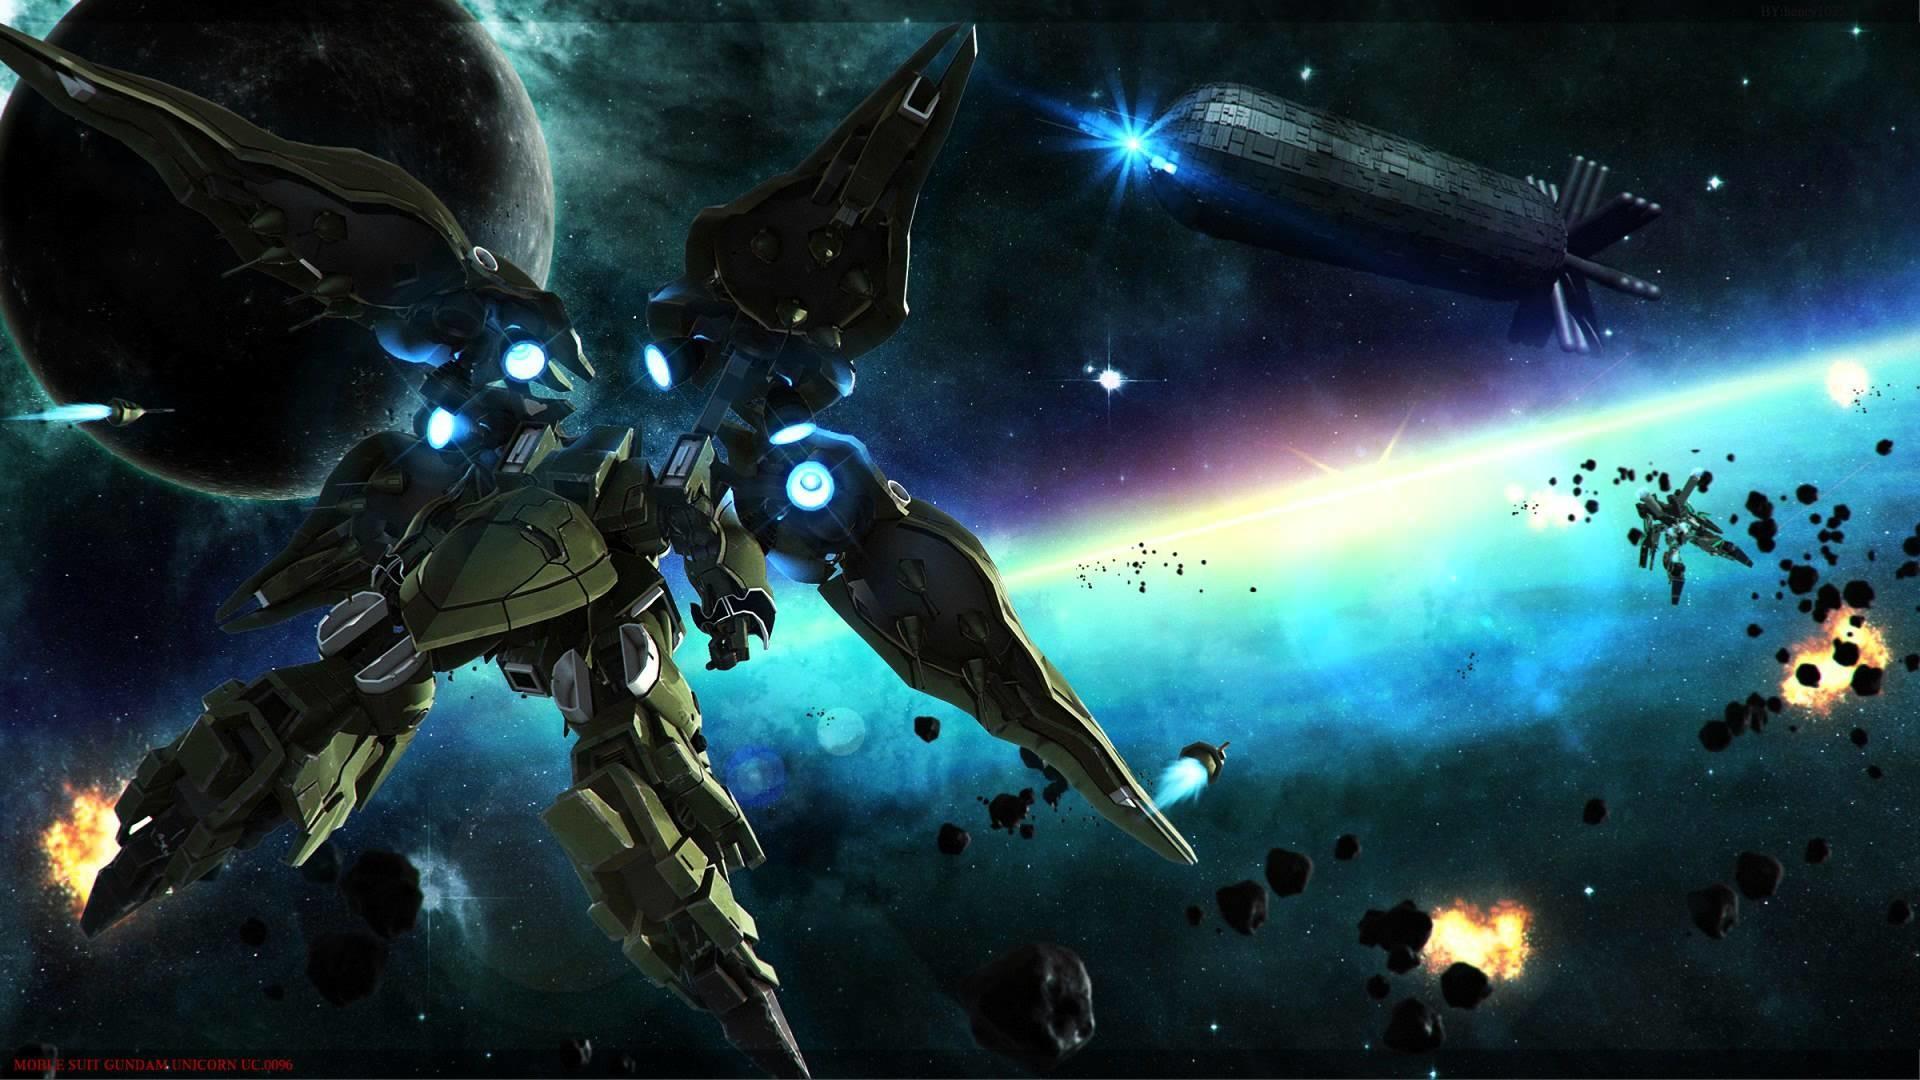 REC Mix – Gundam Unicorn OST 2 – 15 (High Quality 1080p .